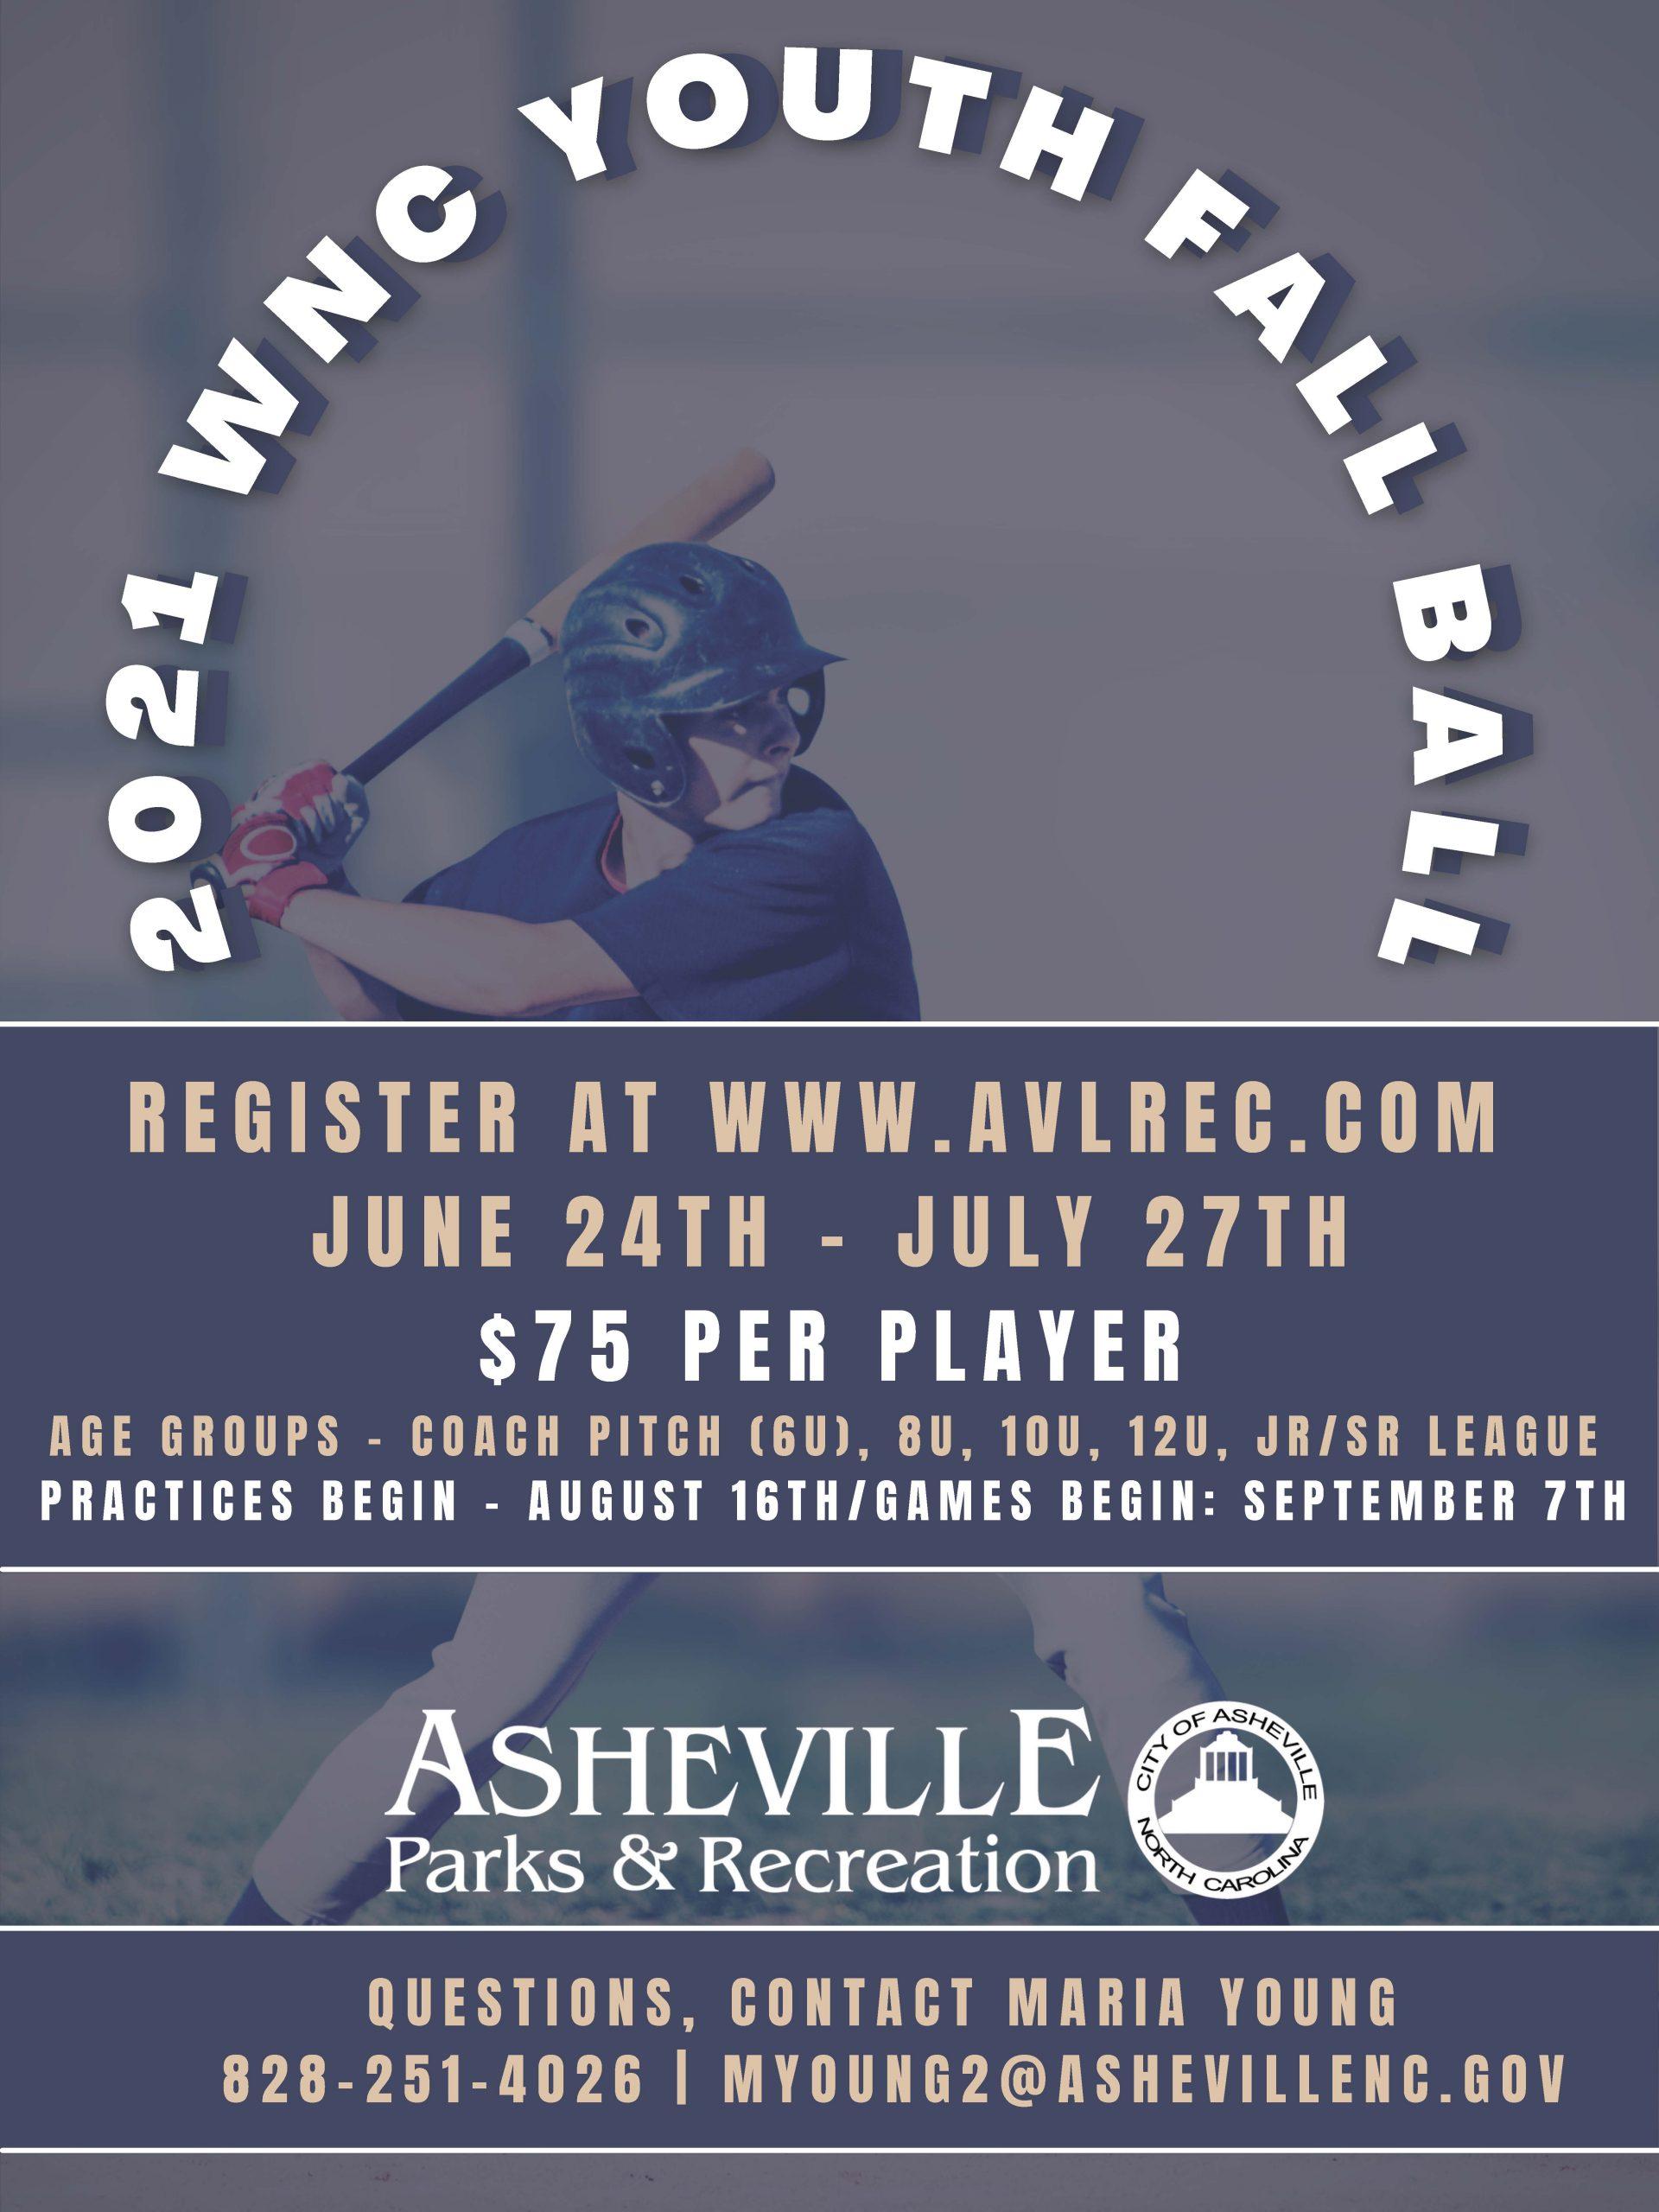 Youth Baseball Flyer